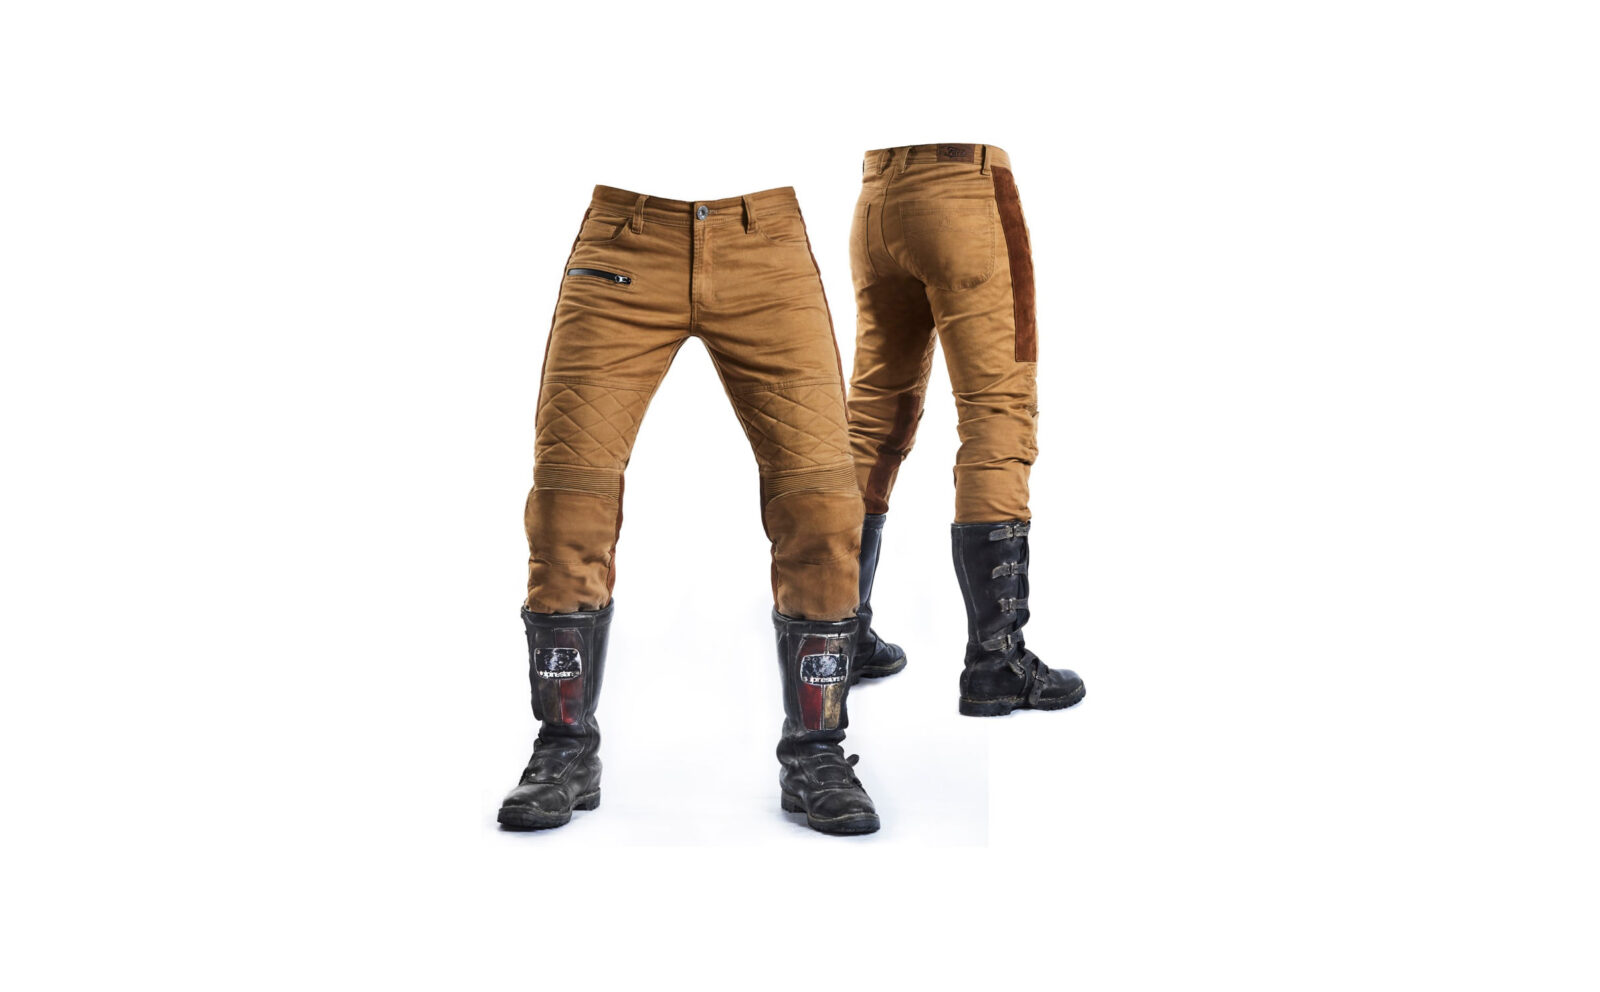 Fuel Sergeant Motorcycle Pants 1600x992 - Para-Aramid Motorcycle Gear - Fuel Sergeant Pants